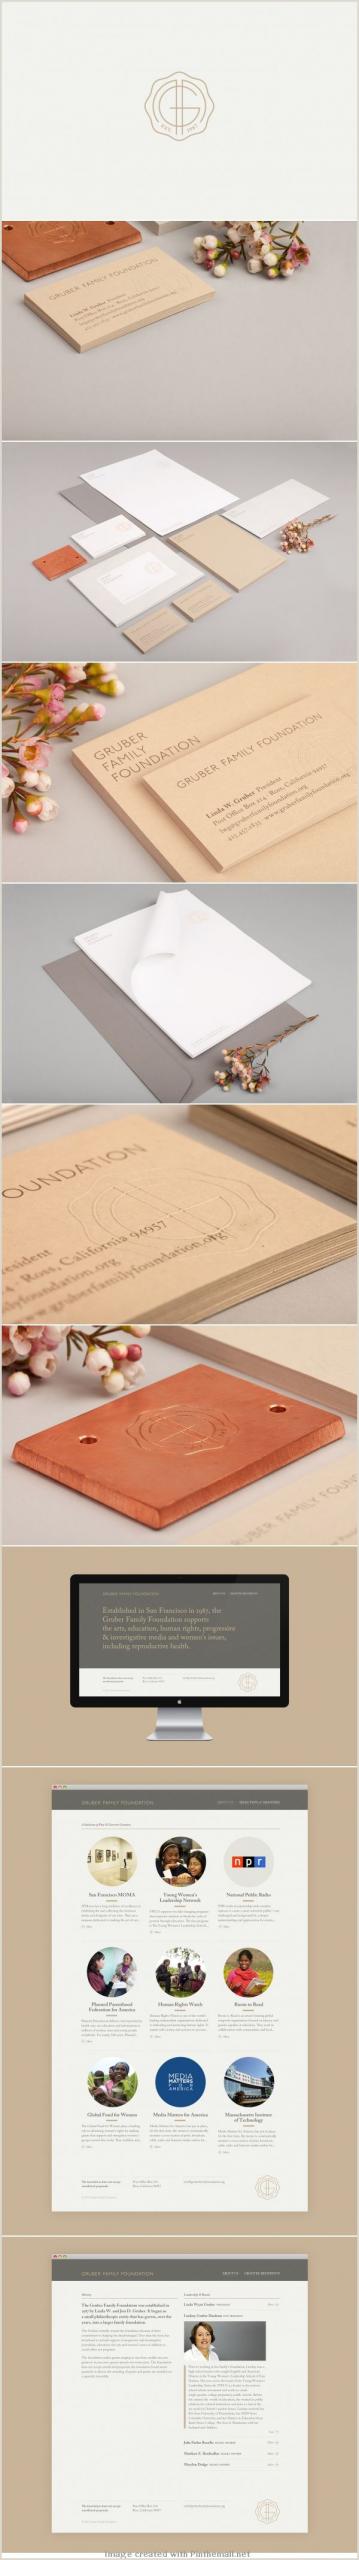 Post It Business Cards 14 Popular Hardwood Flooring Business Card Template